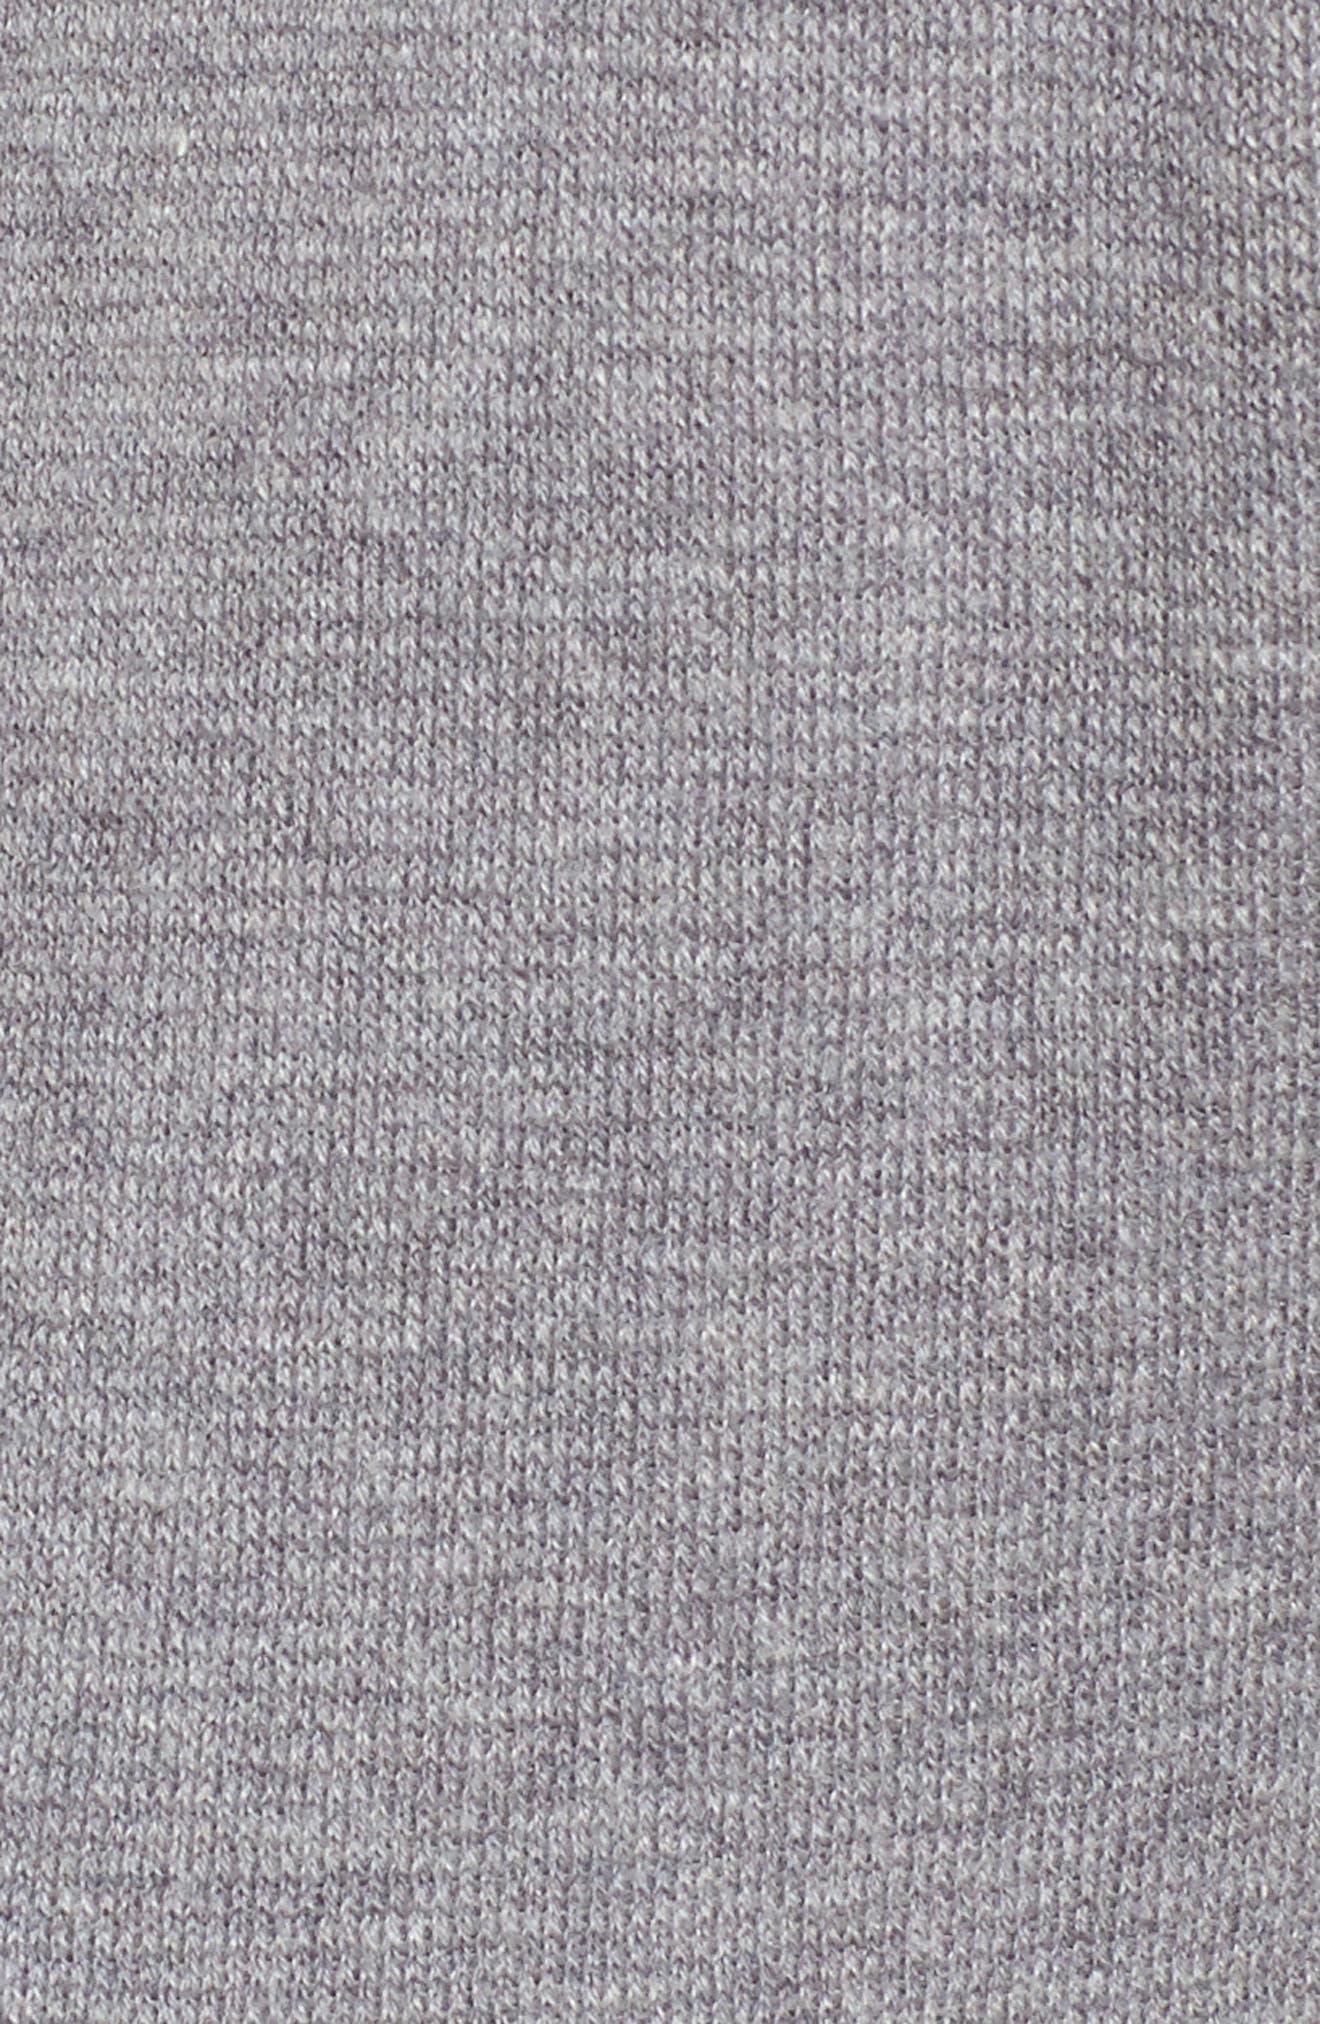 Heathered Knit Pants,                             Alternate thumbnail 5, color,                             WARM GREY